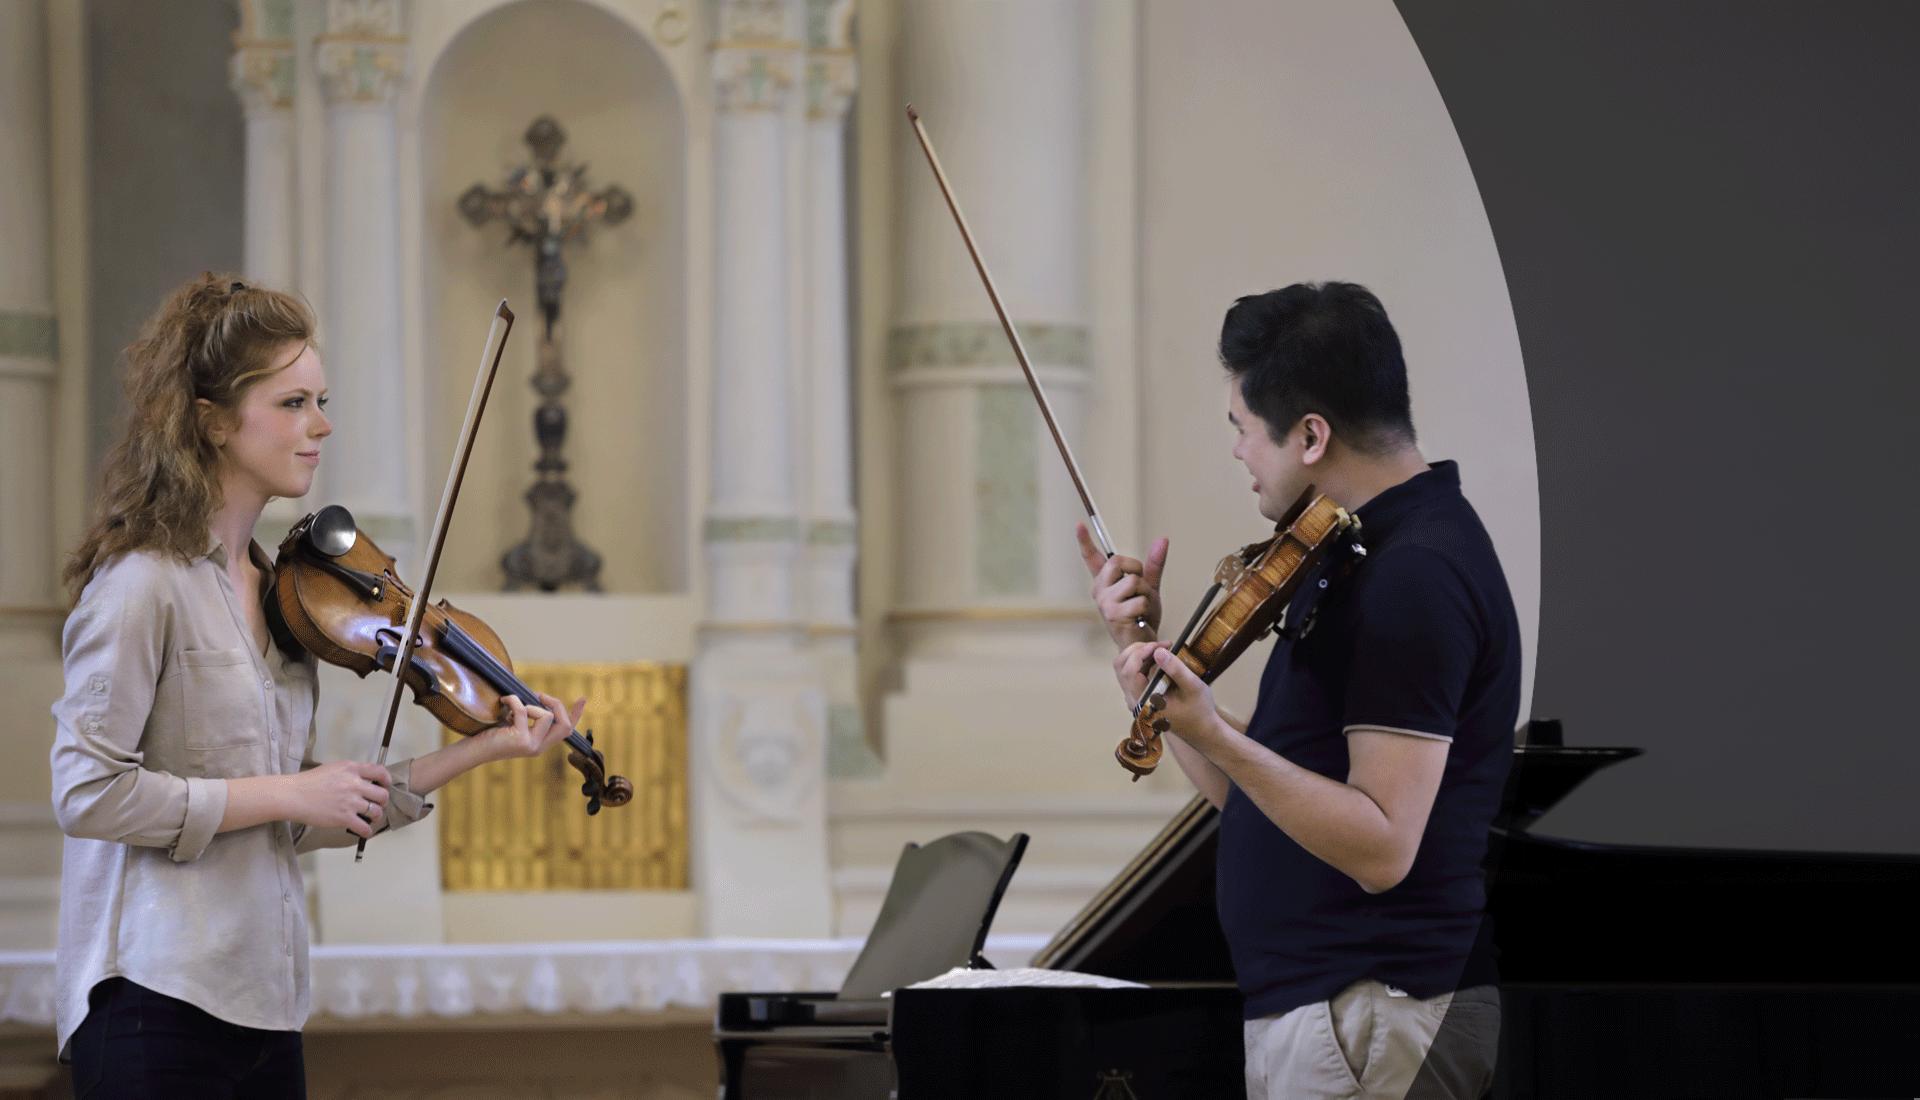 Masterclass with Bùi Công Duy, Borromeo Music Festival 2018